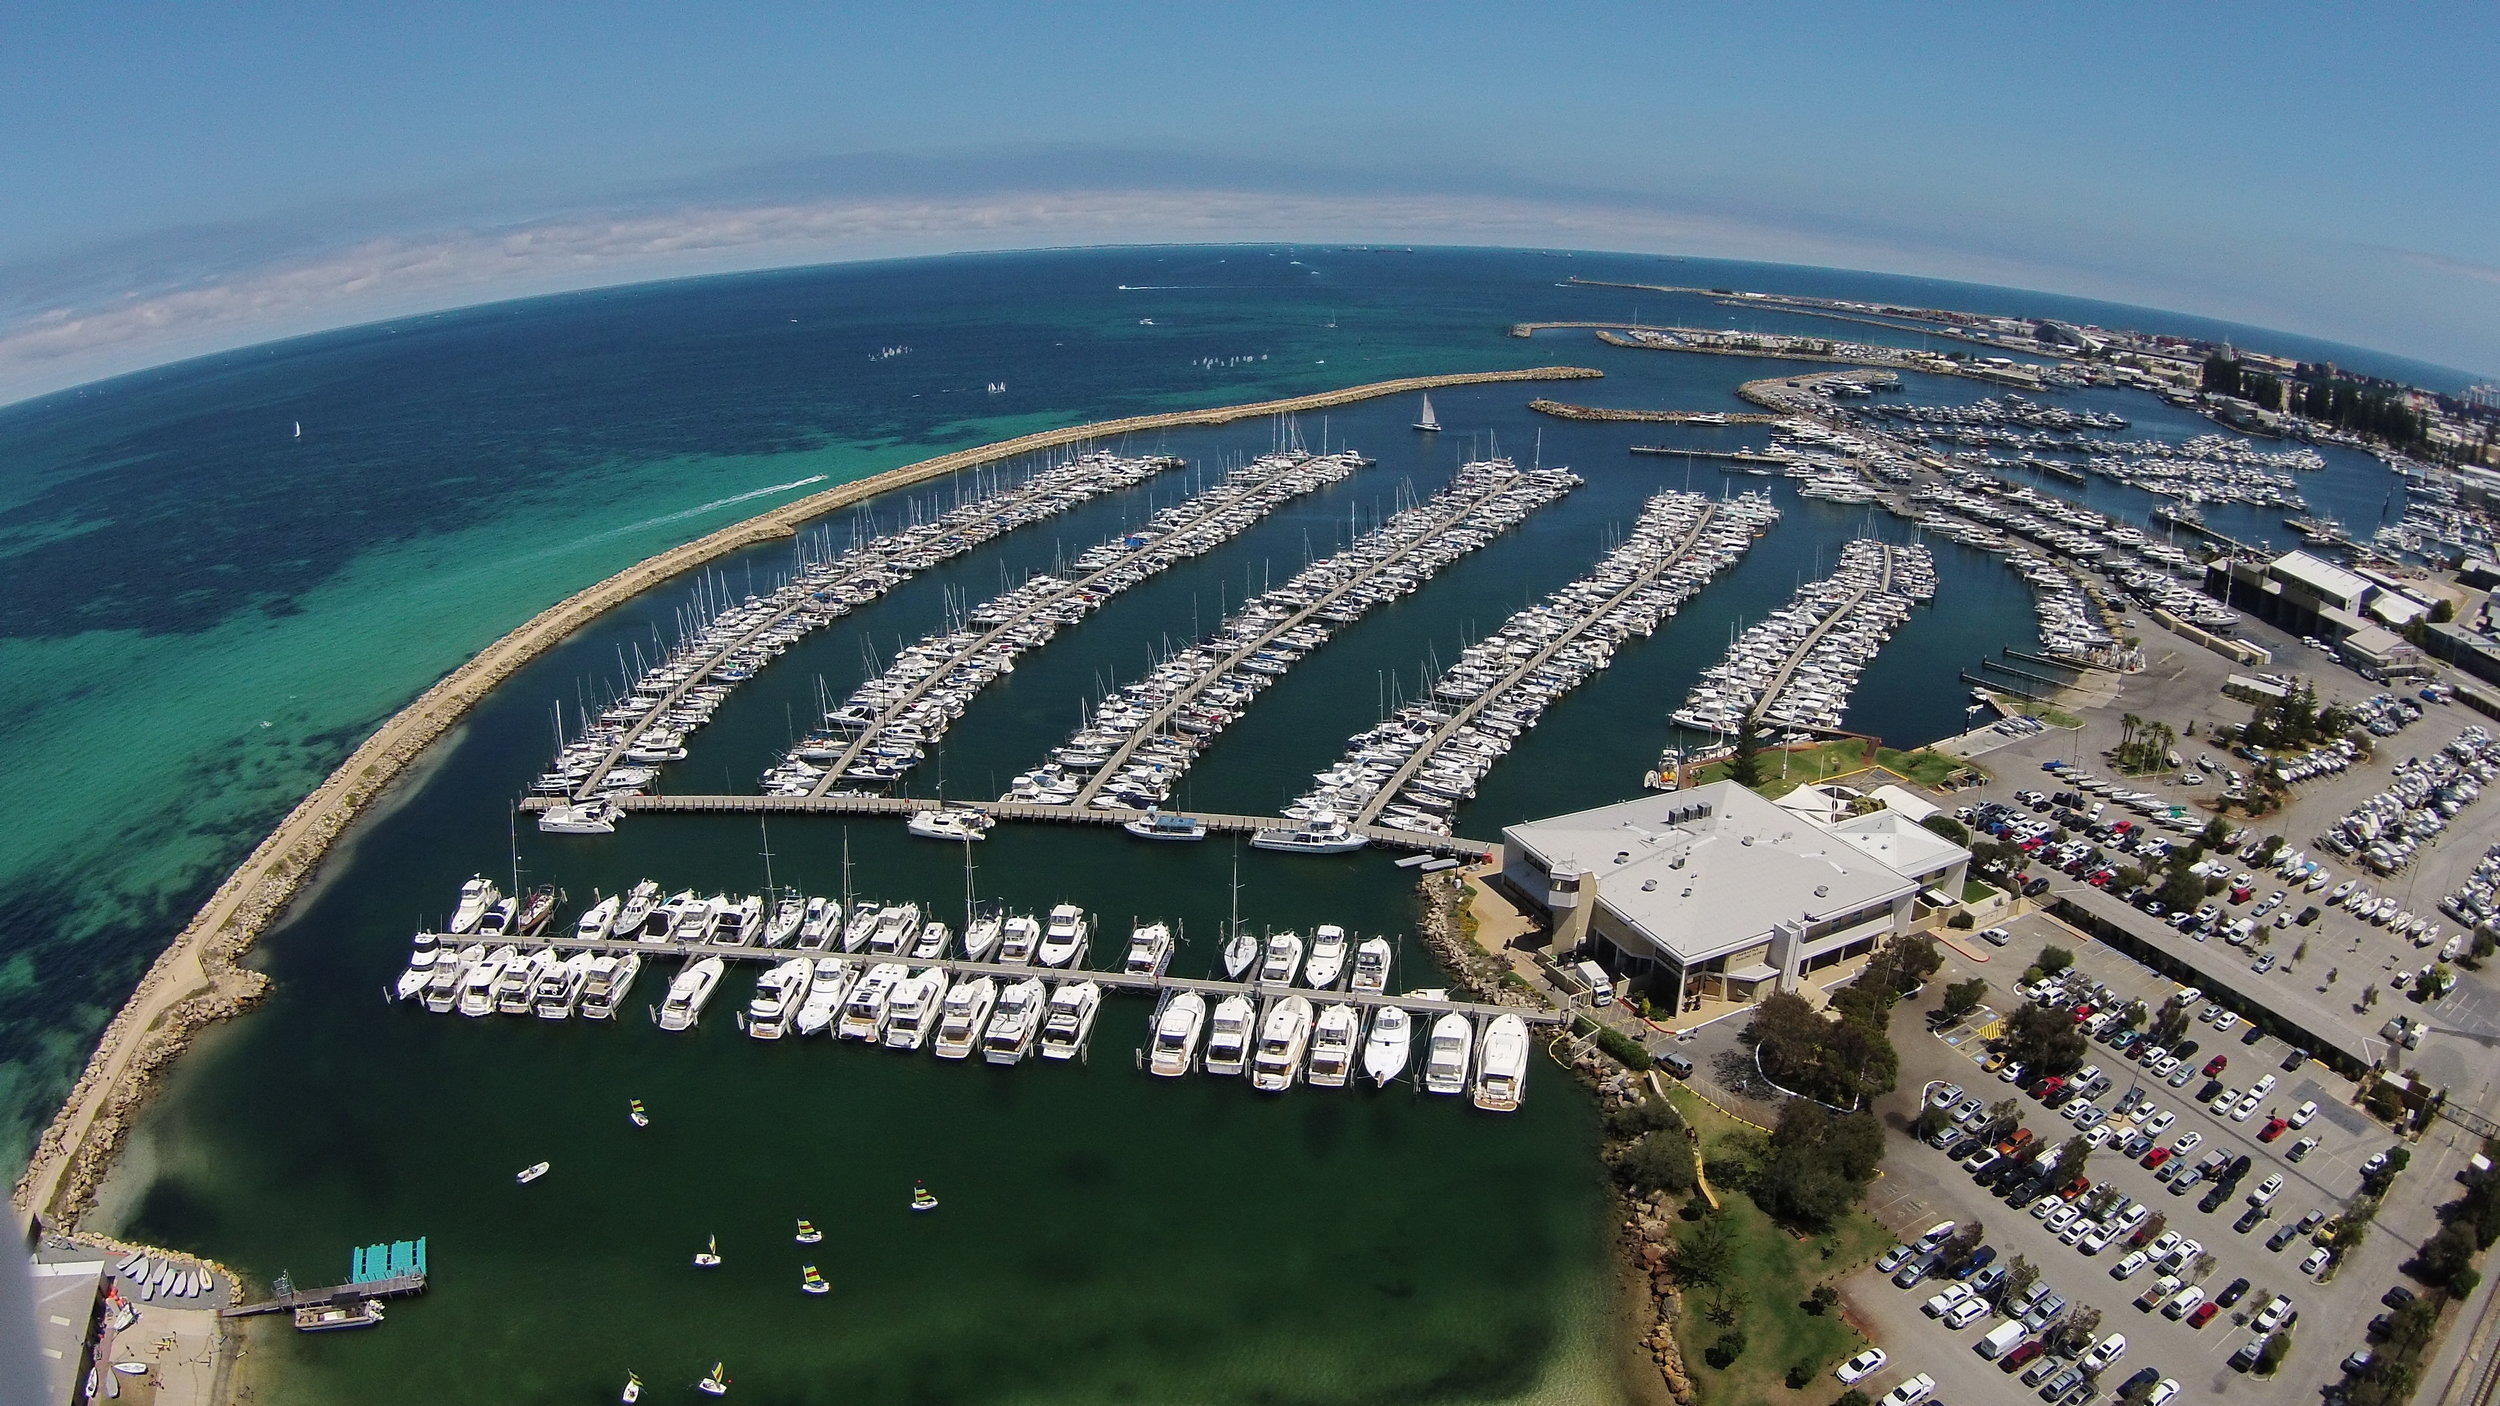 Fremantle_Sailing_Club_Aerial.jpeg